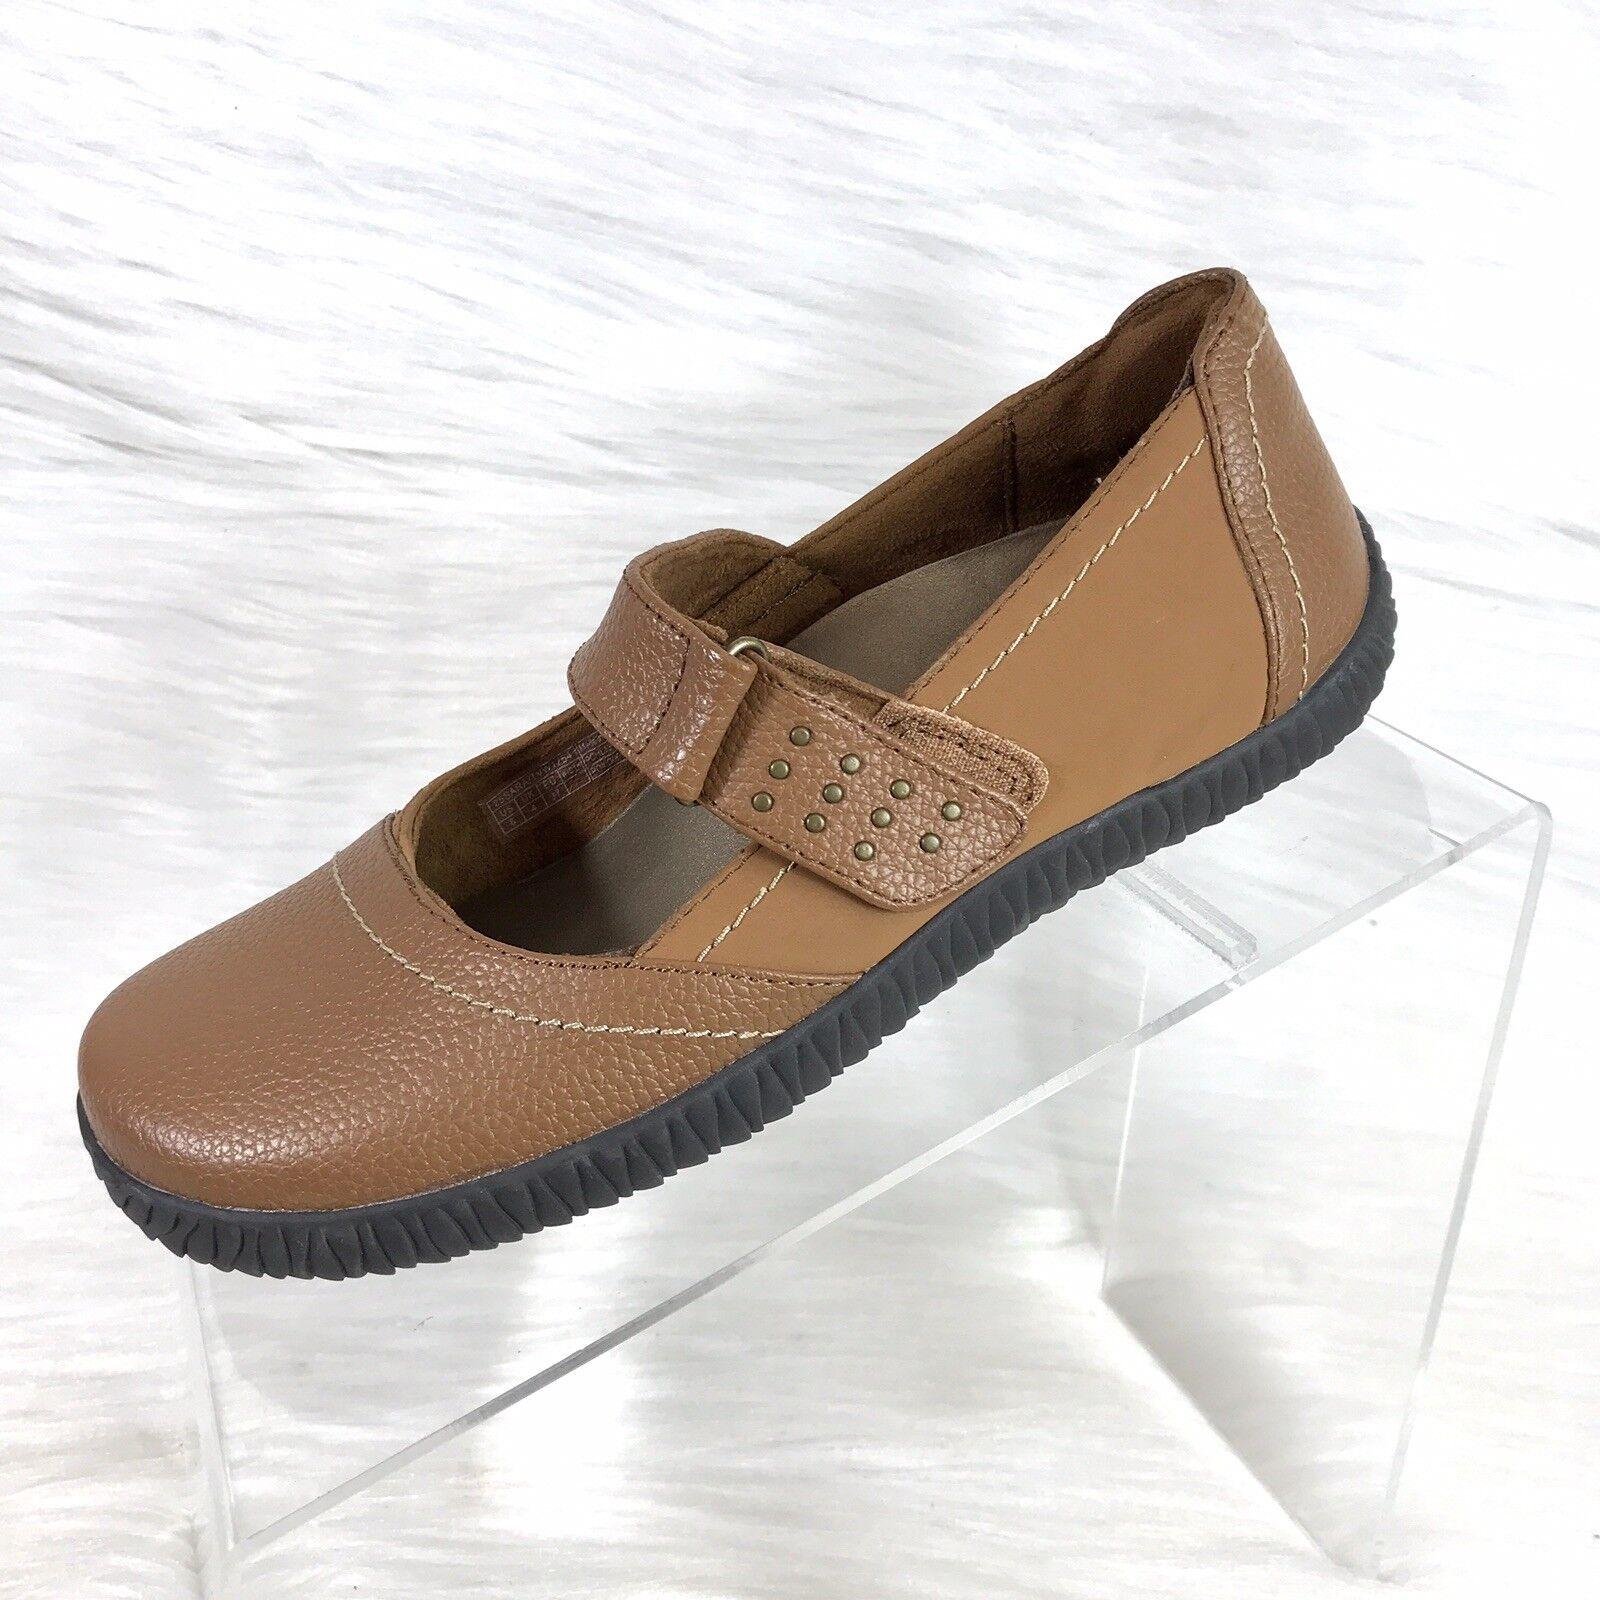 Orthaheel Sara Women's Mary Jane Comfort shoes Size 6